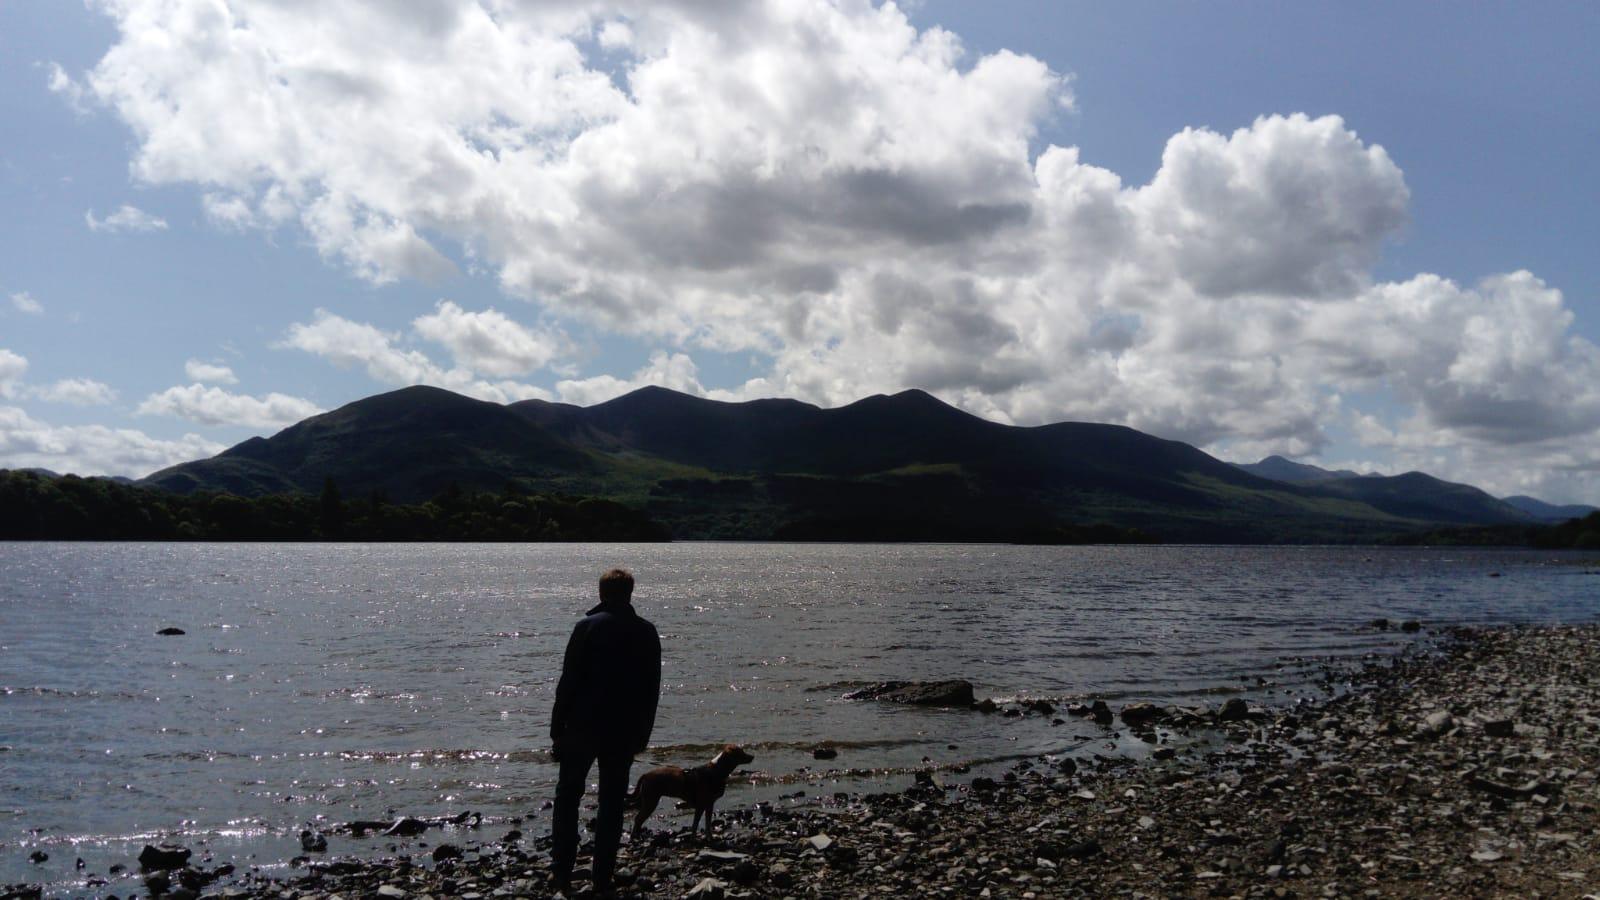 Man standing on Lake Leane shore